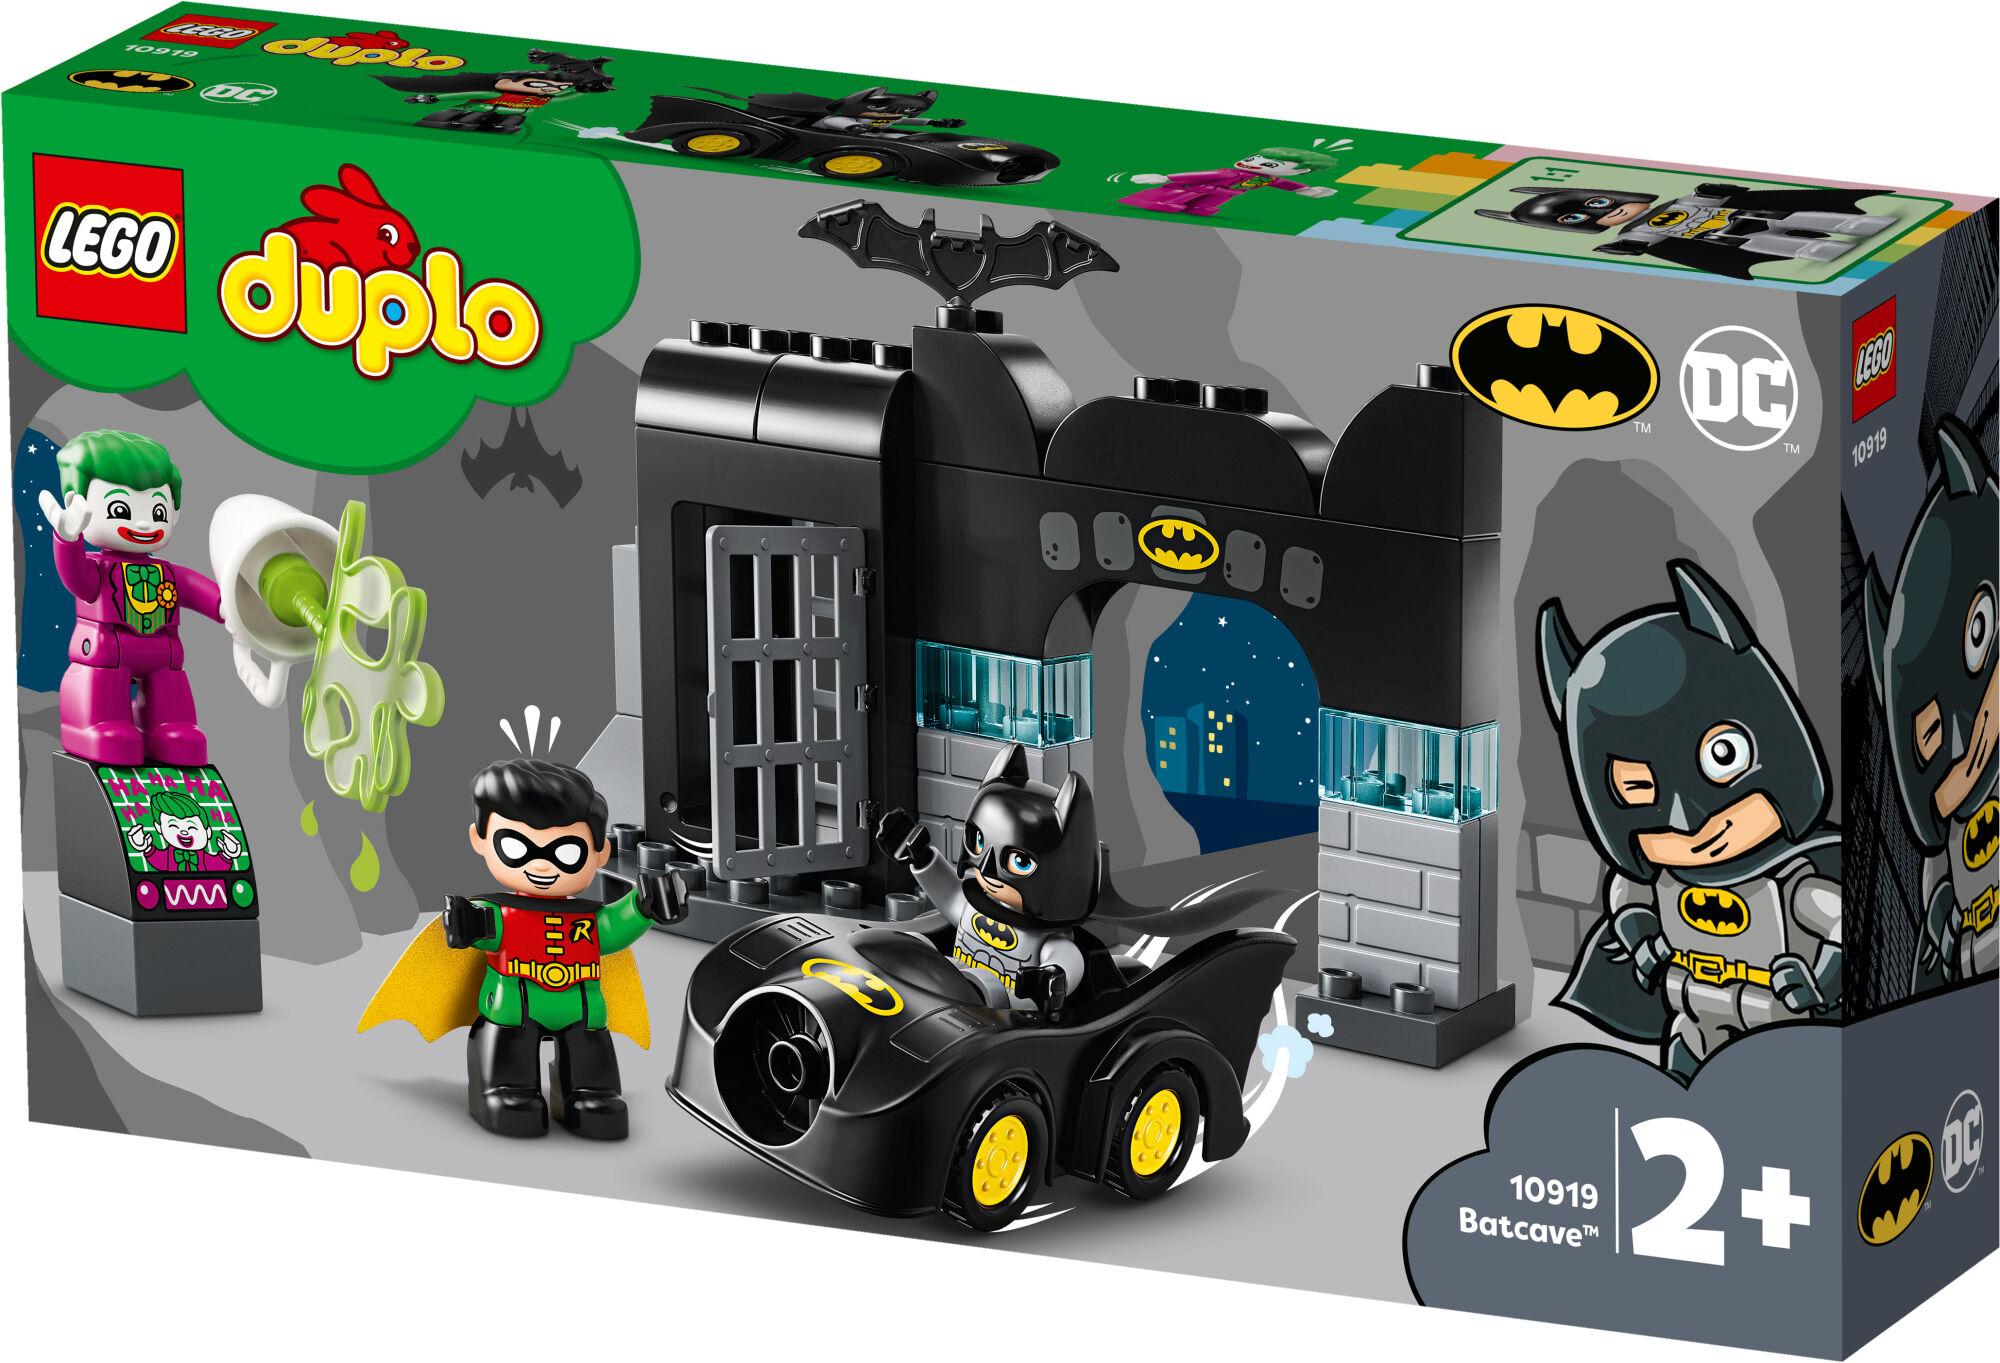 Lego DUPLO Super Heroes 10919 Lepakkoluola